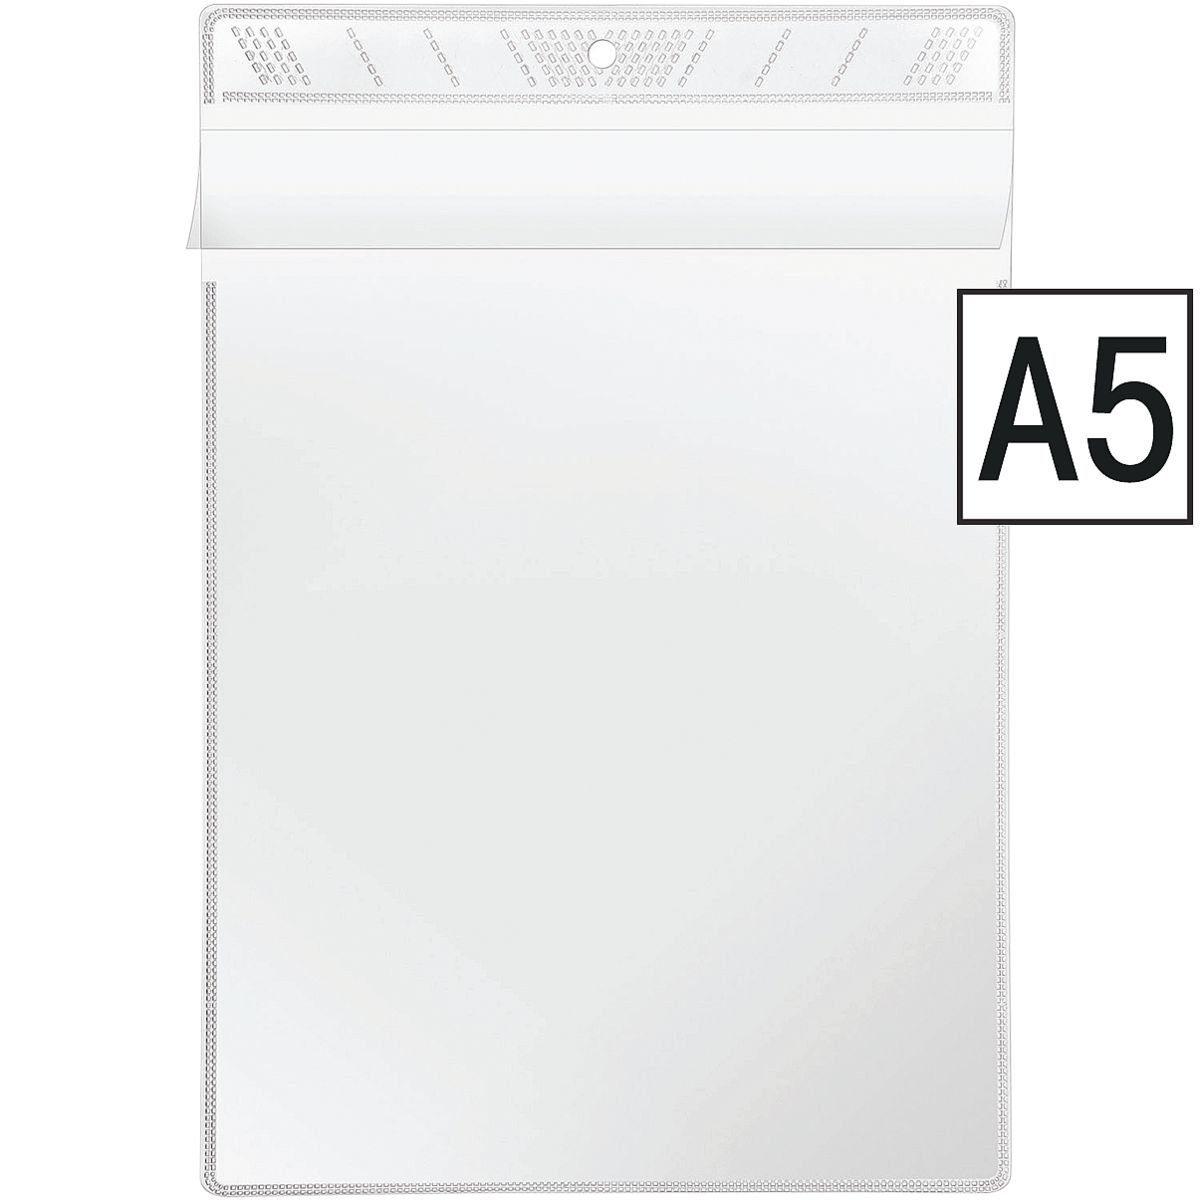 Veloflex 100 Sichttaschen A5 3305000